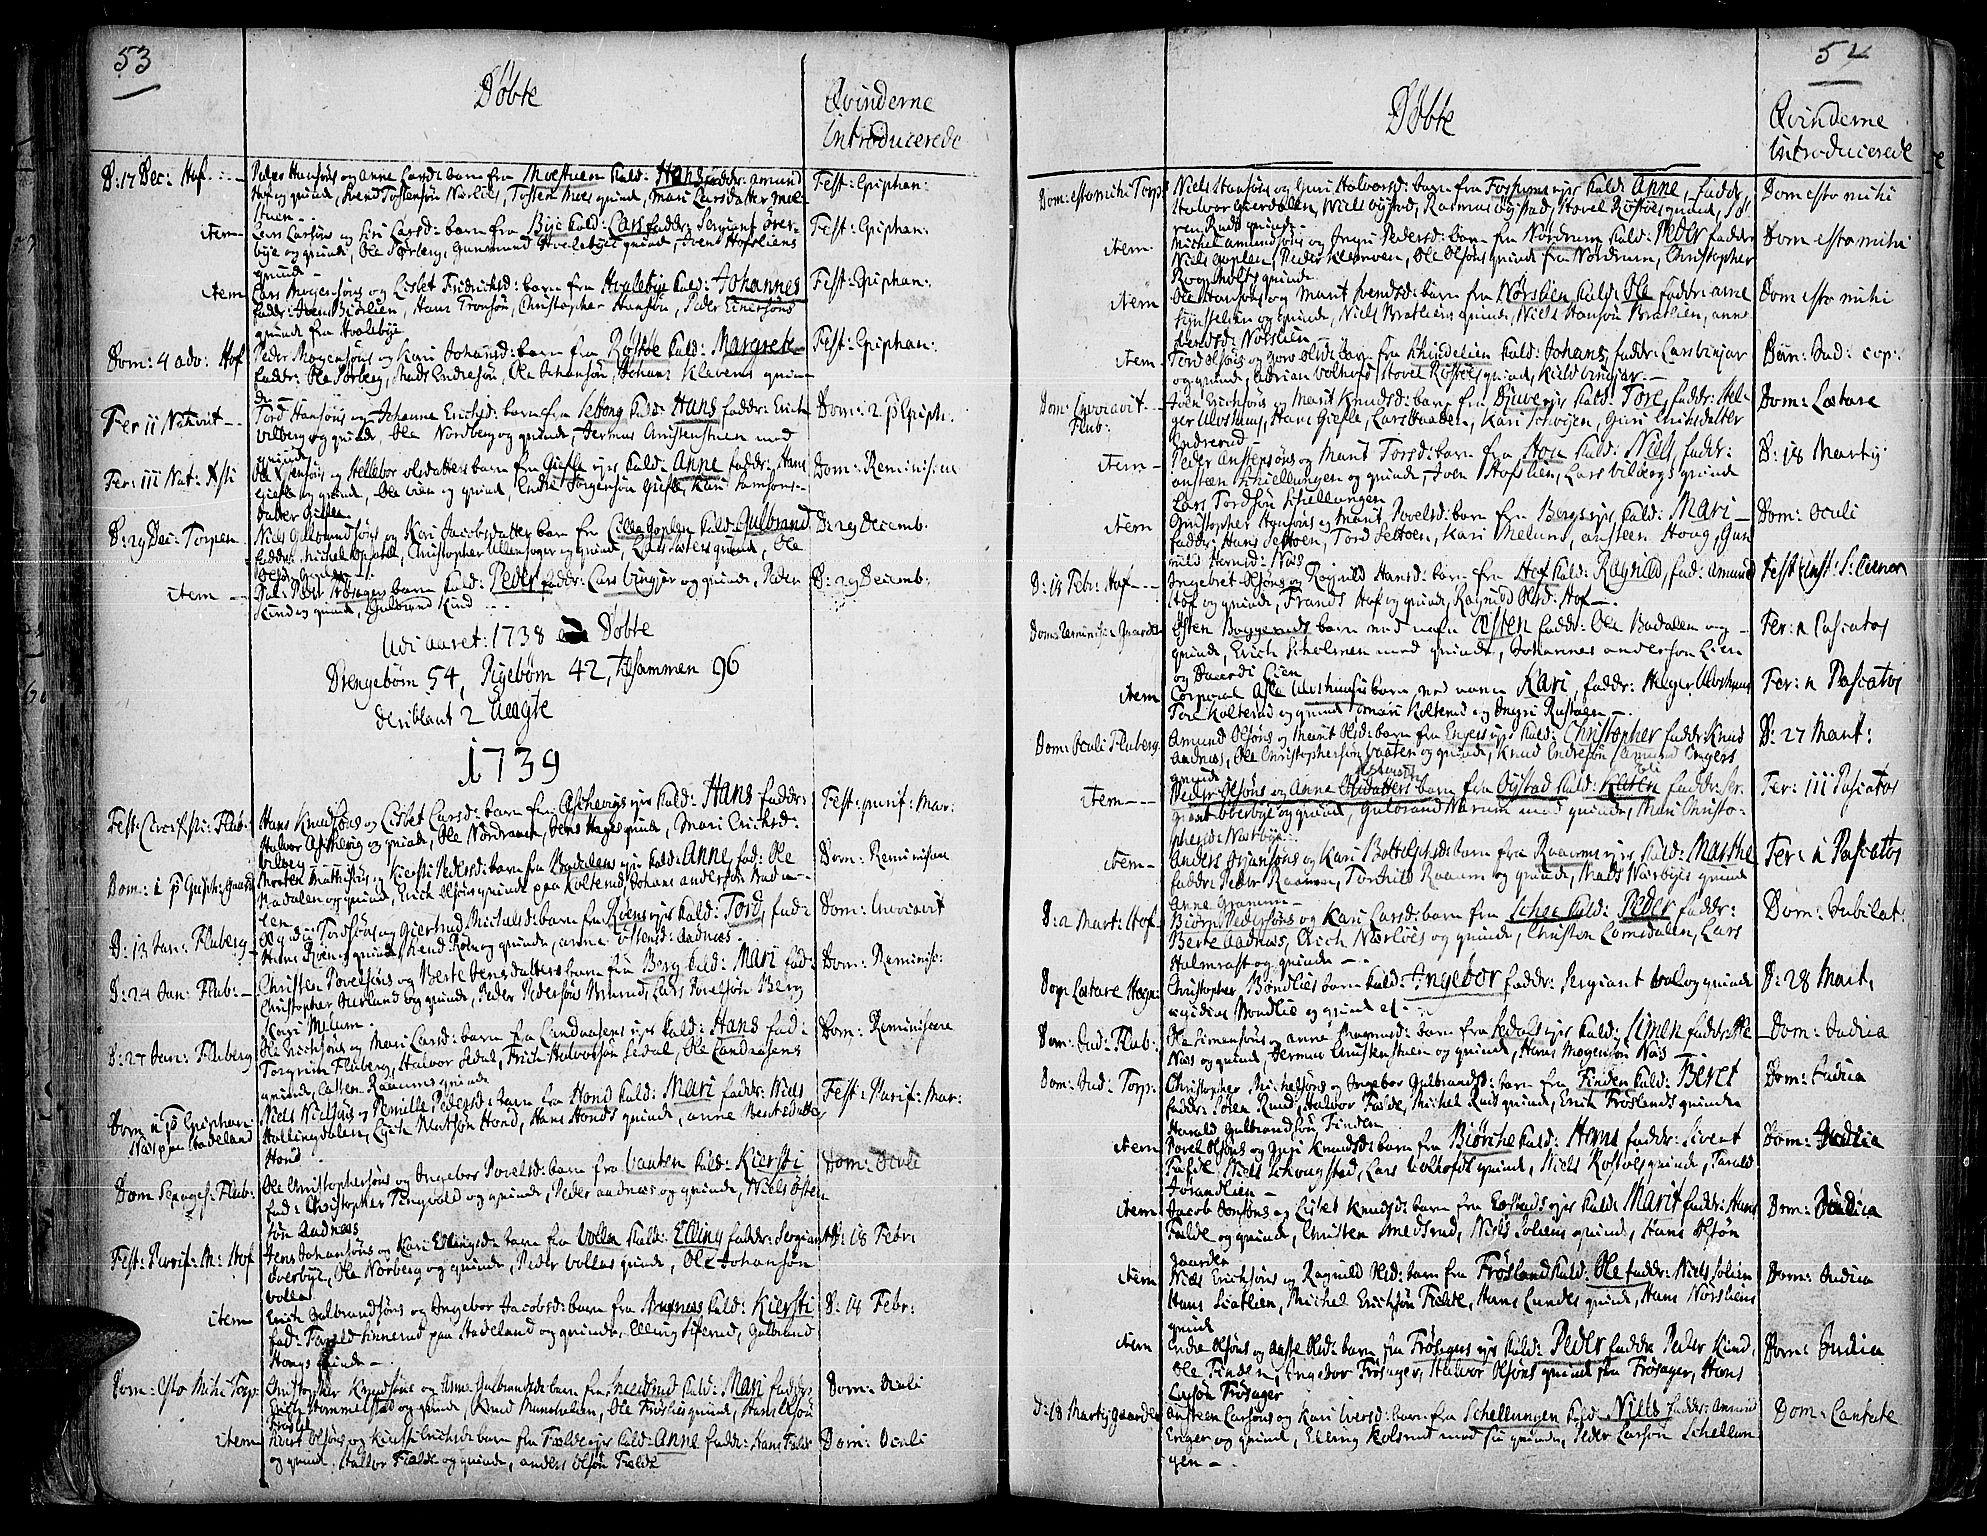 SAH, Land prestekontor, Ministerialbok nr. 2, 1733-1764, s. 53-54